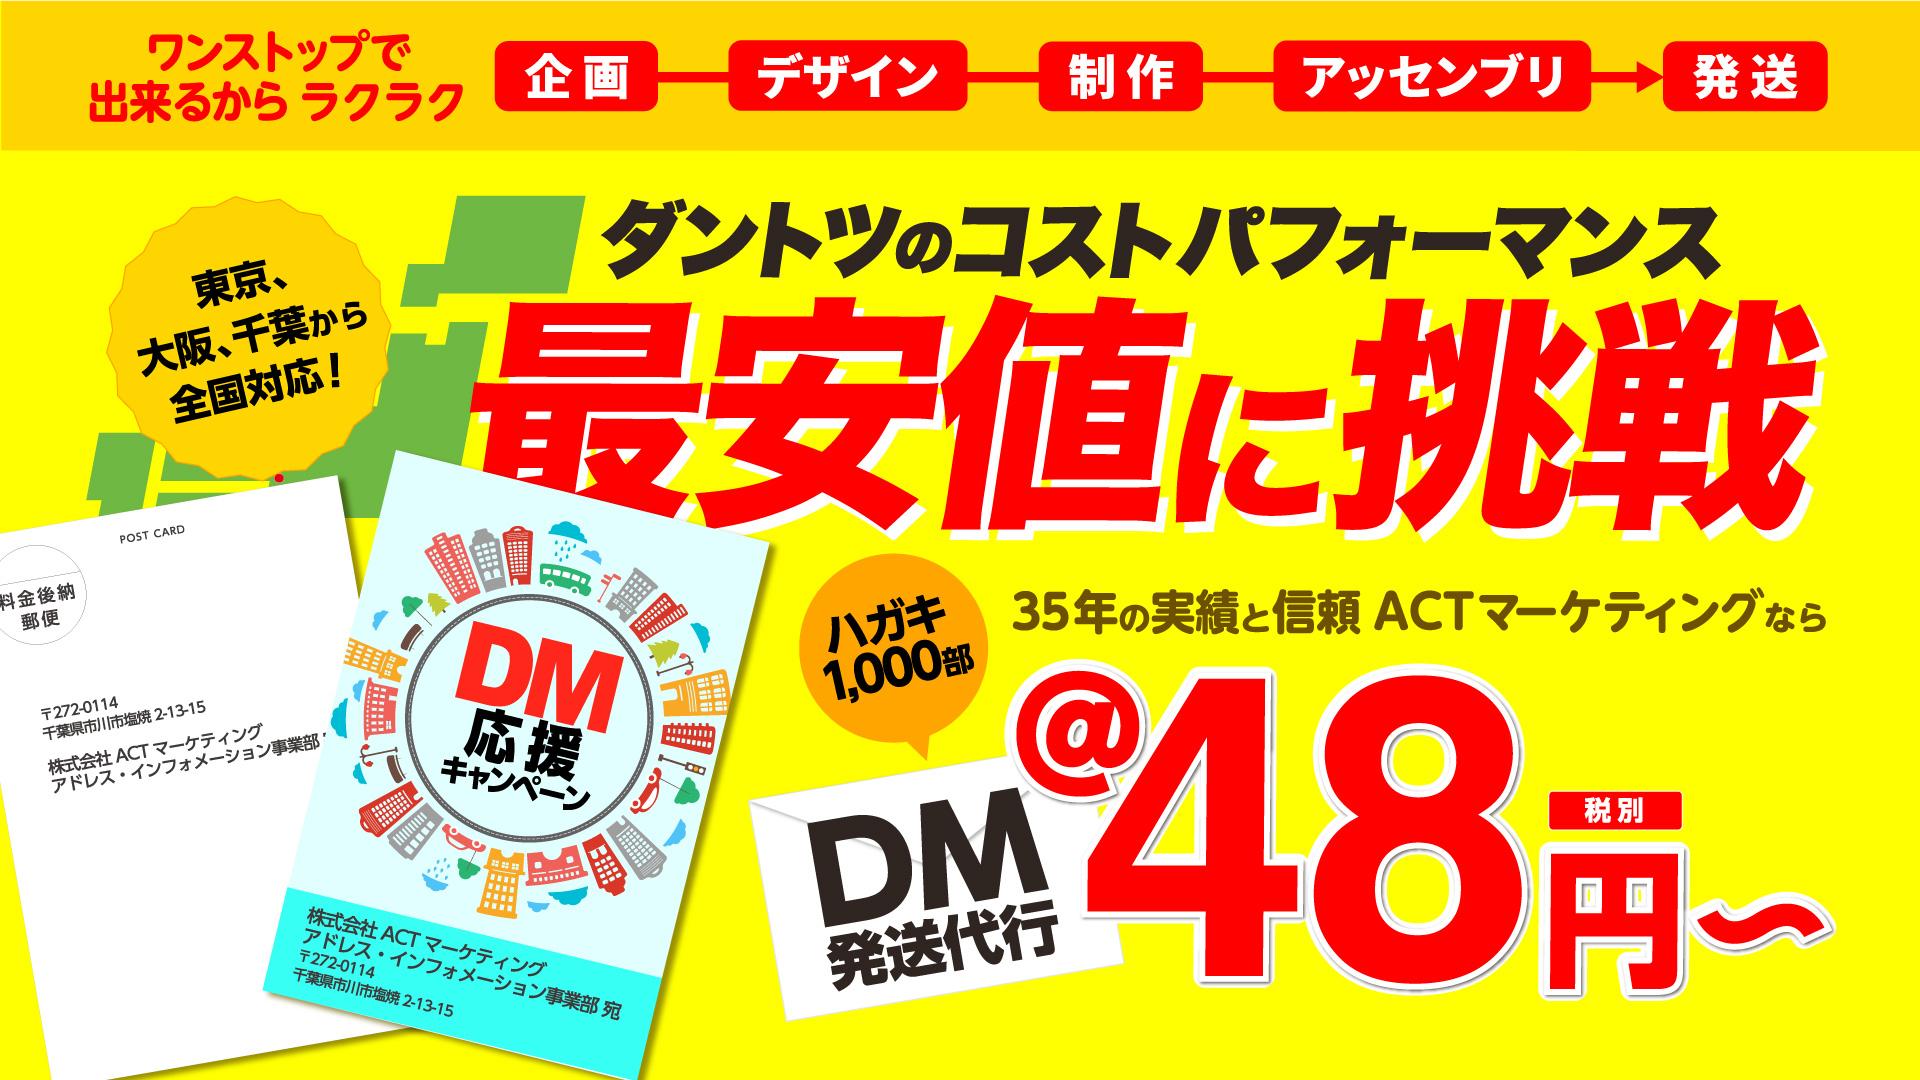 DM発送代行@43円~